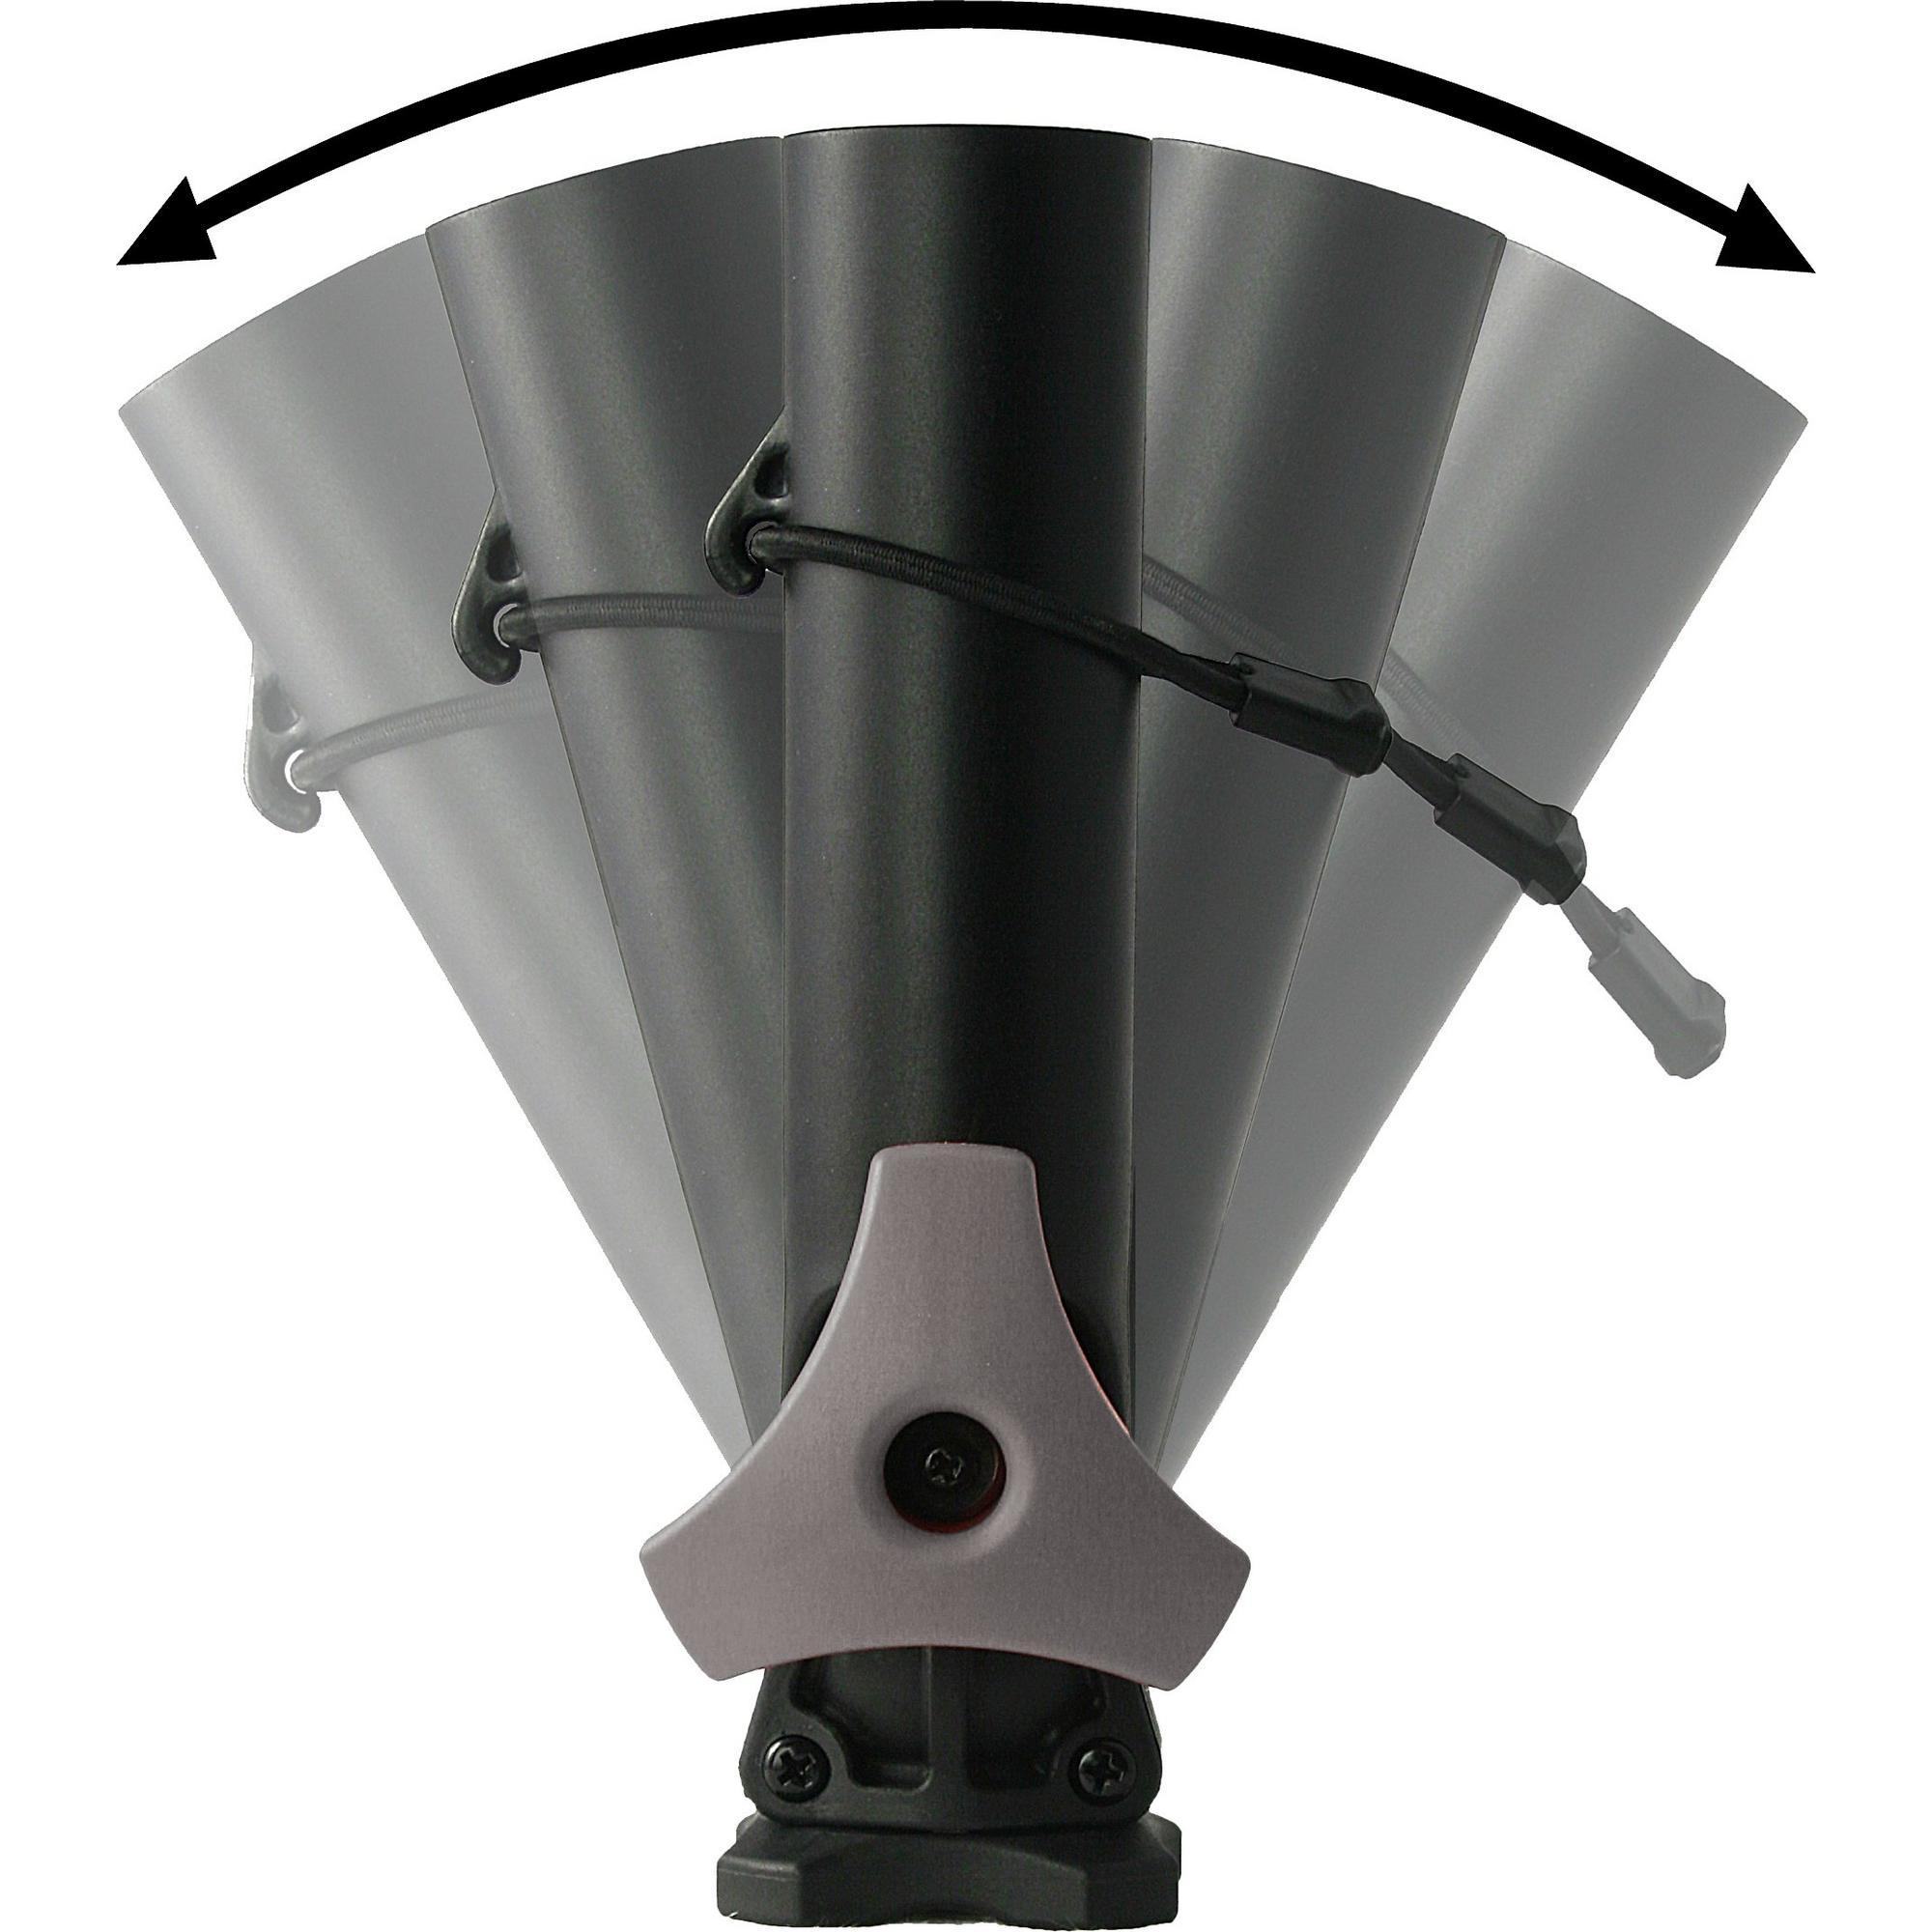 Adjustable Umbrella Holder